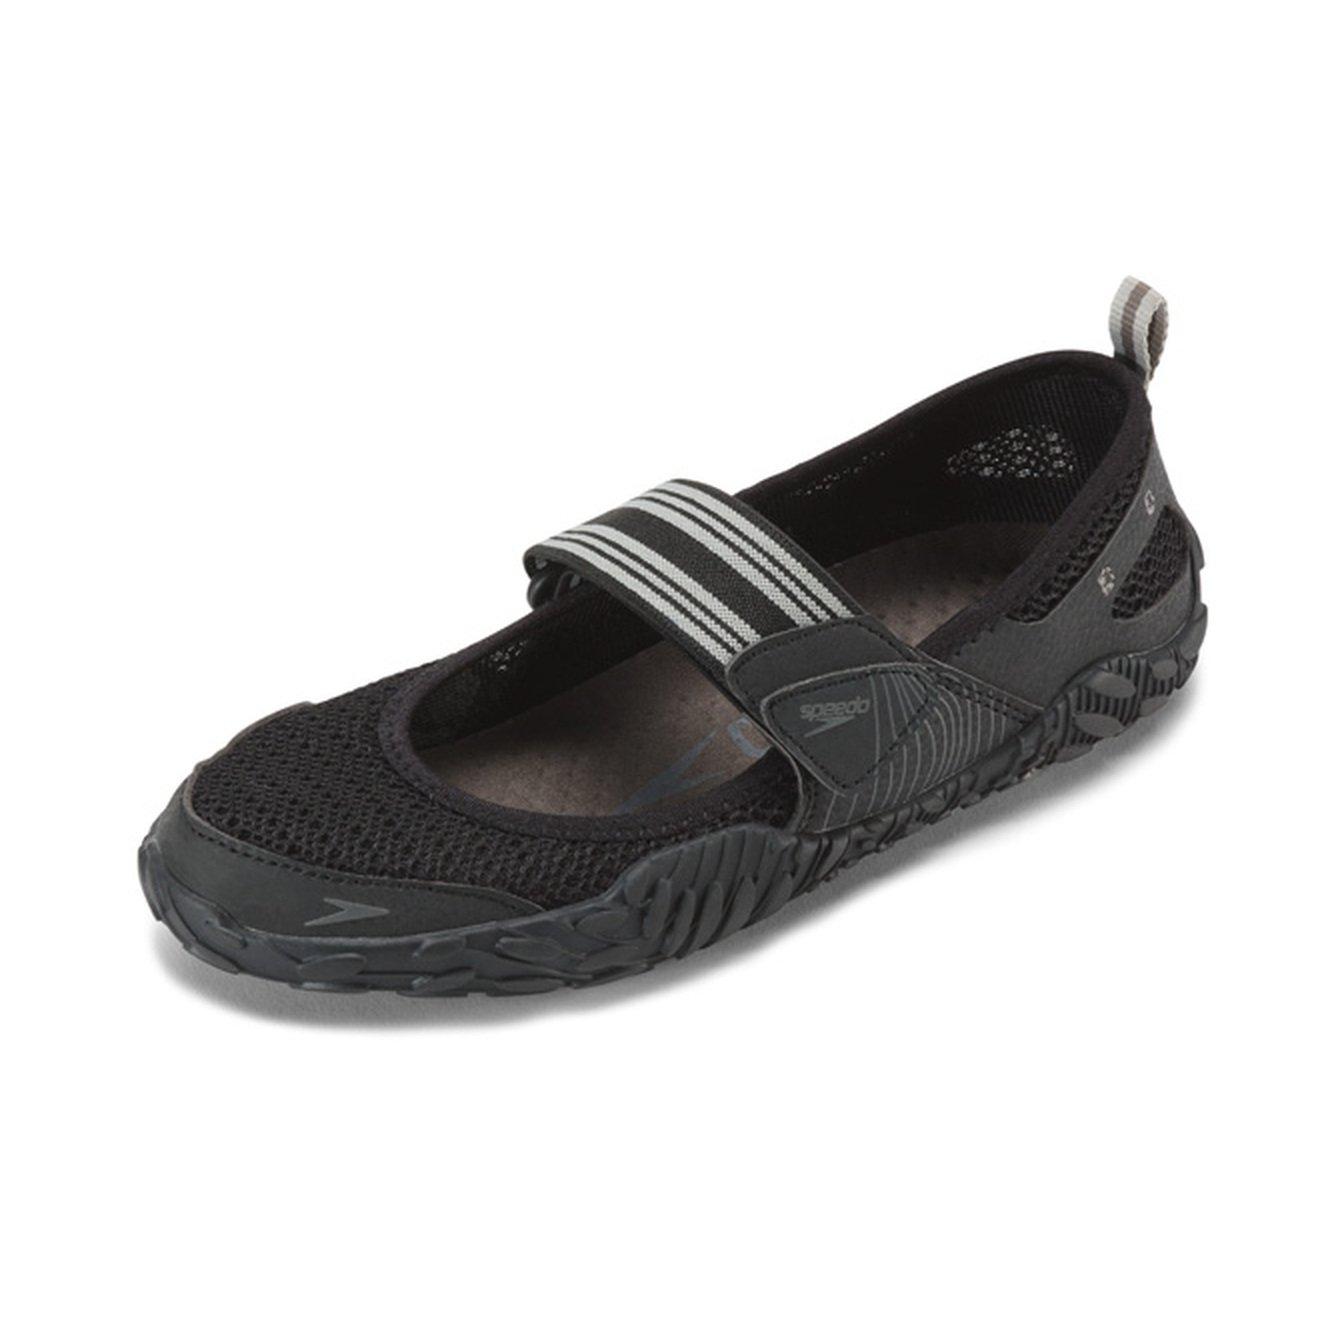 Speedo Women's Offshore Strap Athletic Water Shoe, Black/Black, 7 C/D US